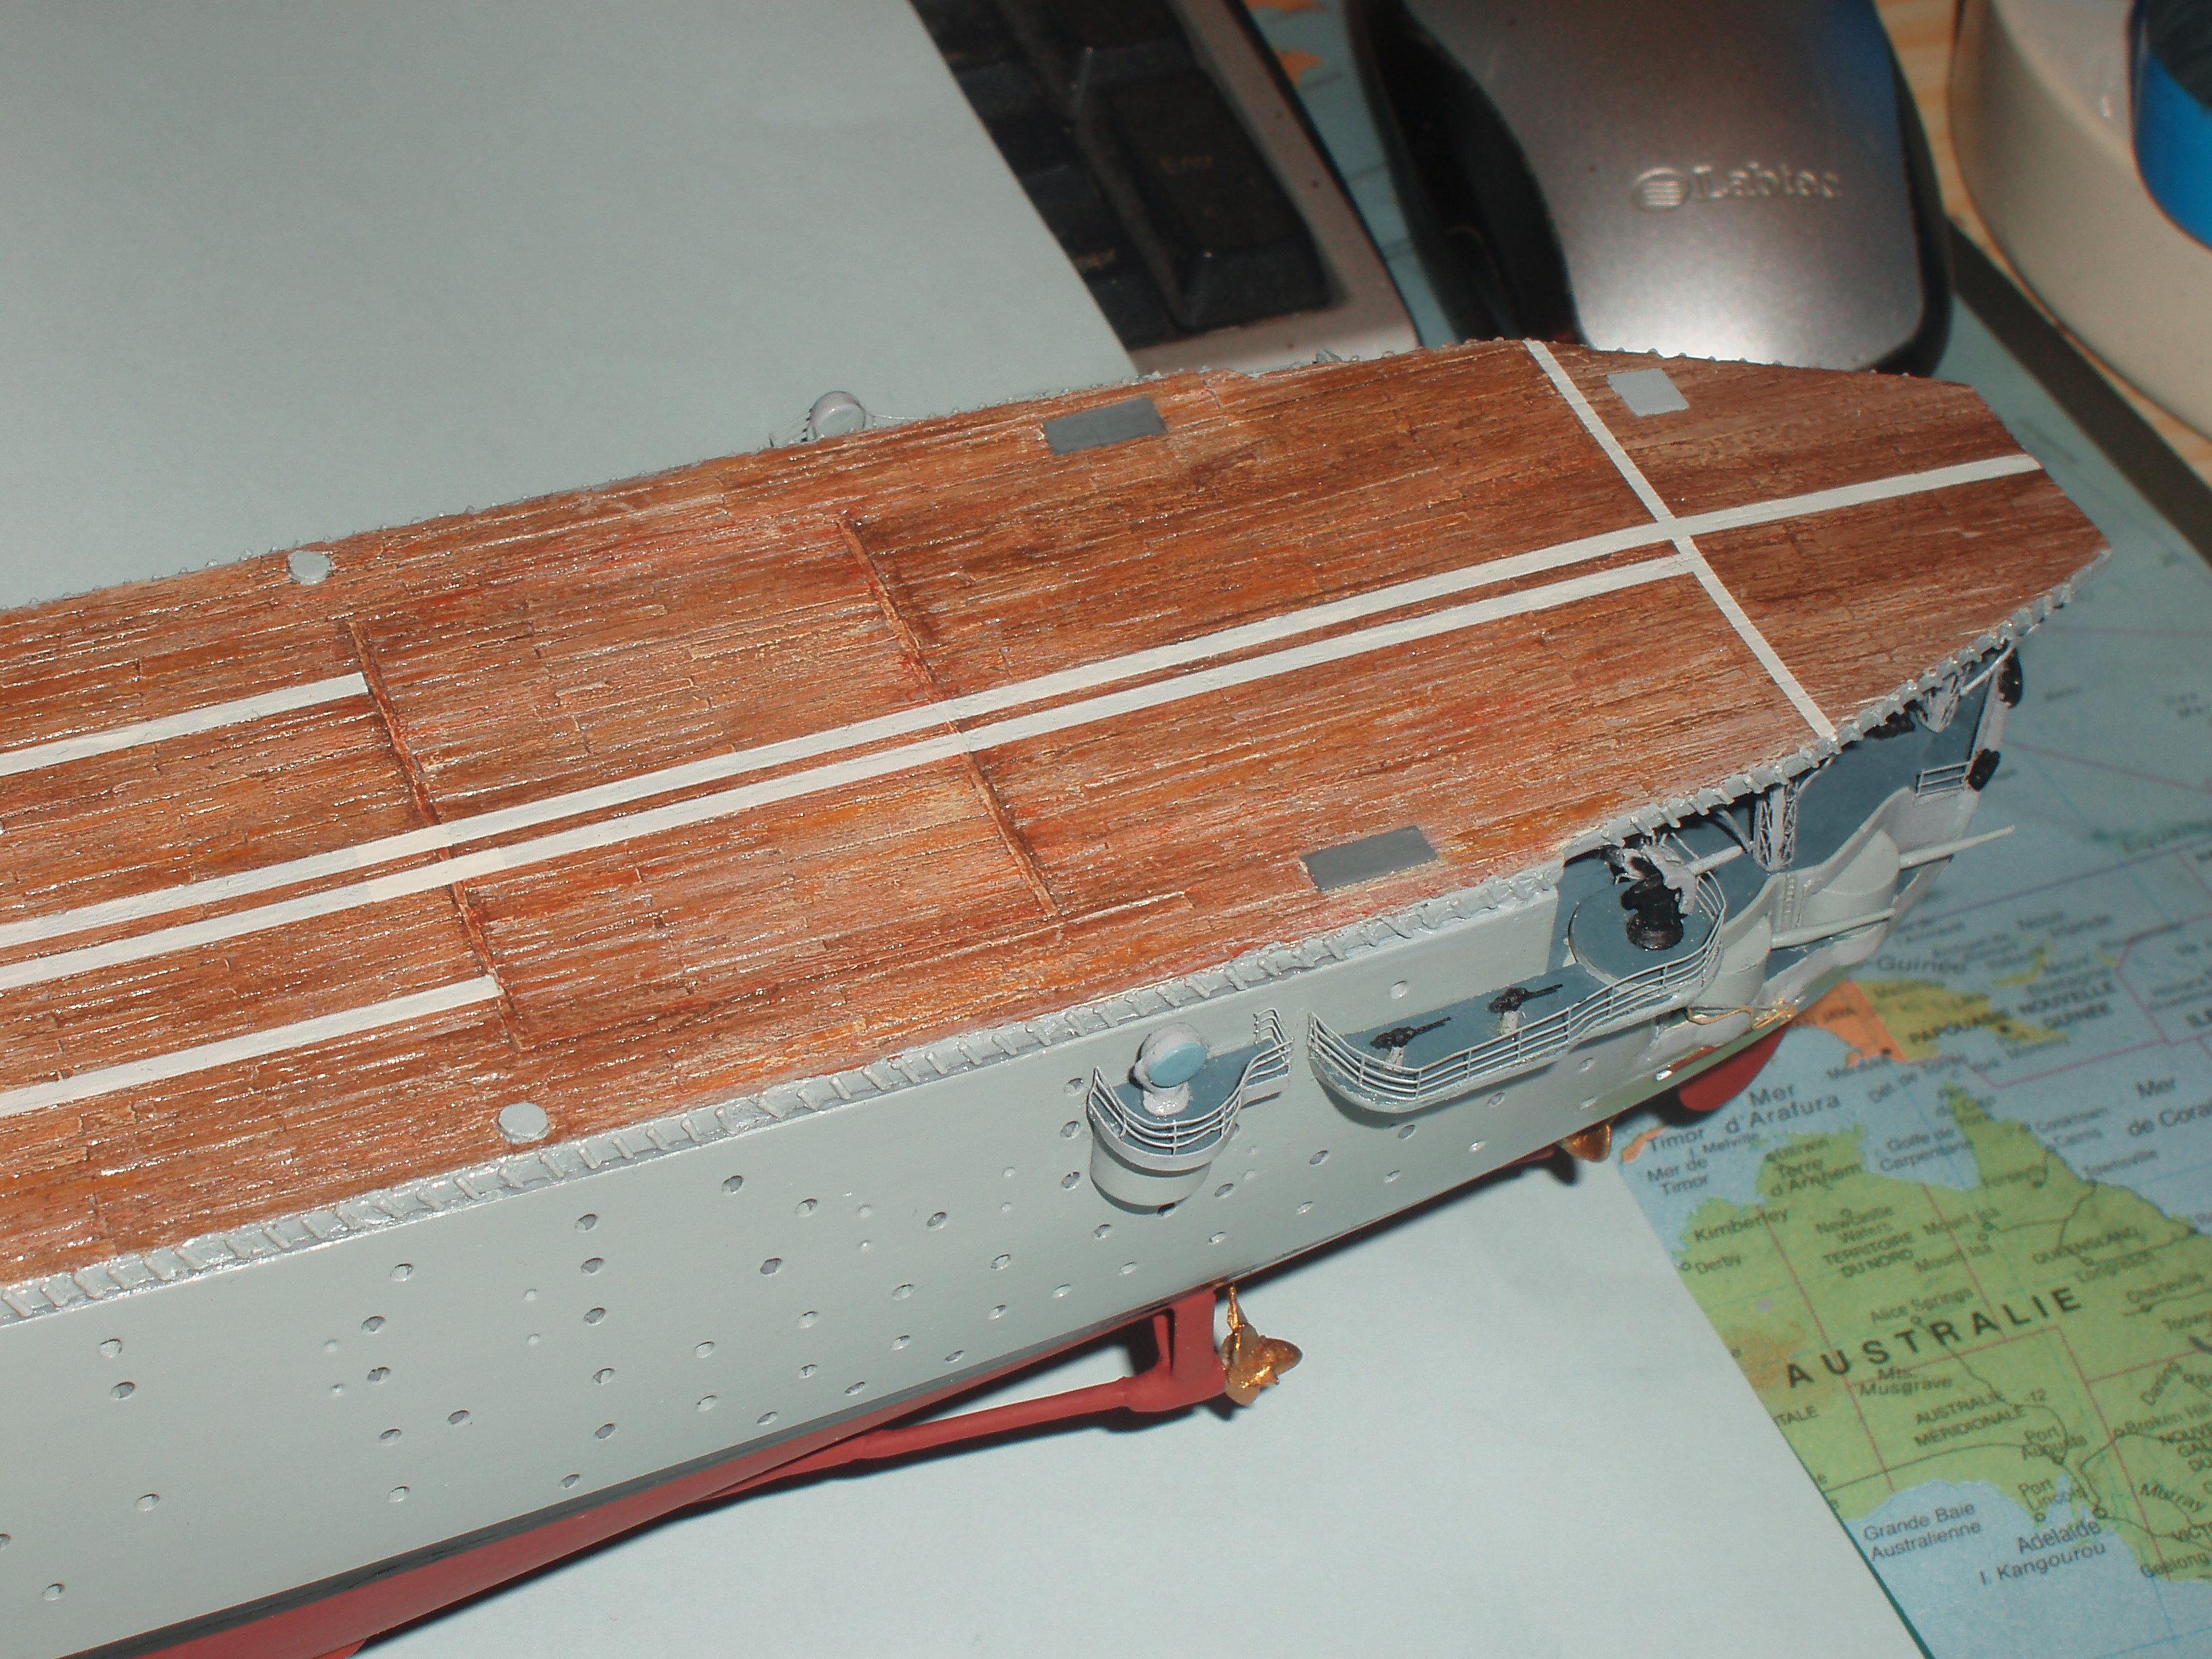 Le porte avions BEARN de l' ARSENAL 270943dio006